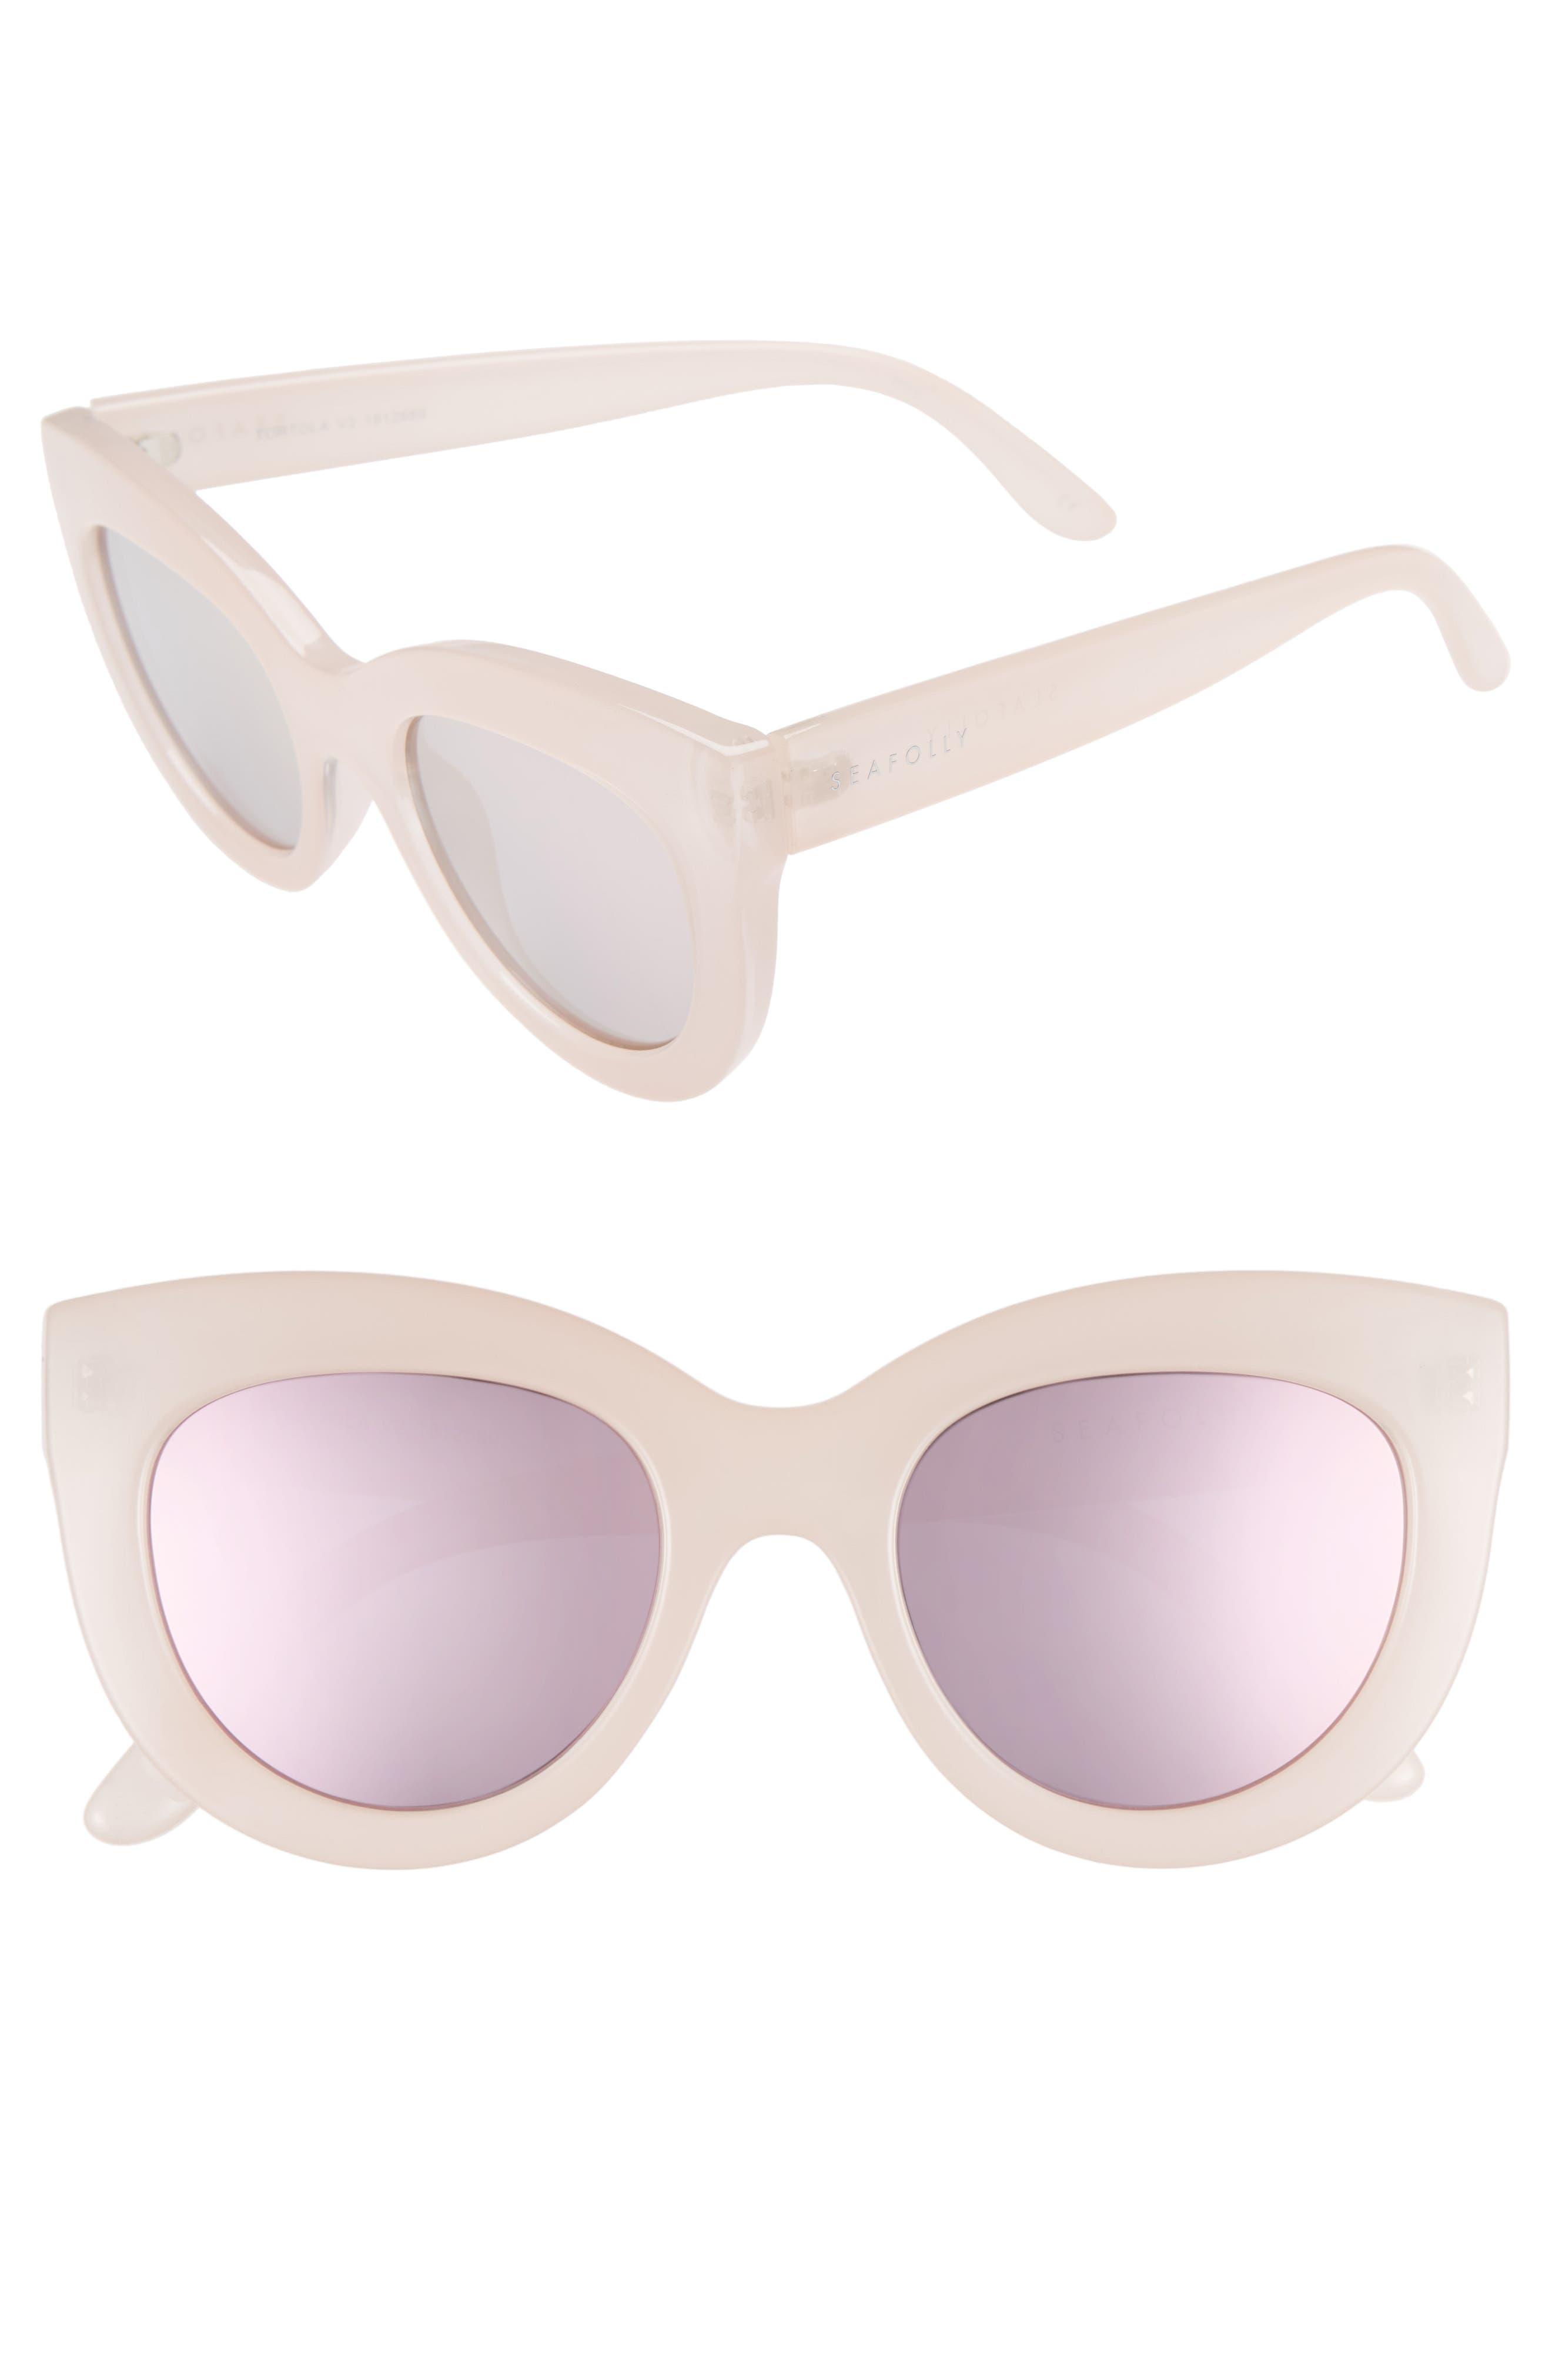 Torola V2 51mm Cat Eye Sunglasses,                         Main,                         color, Blossom